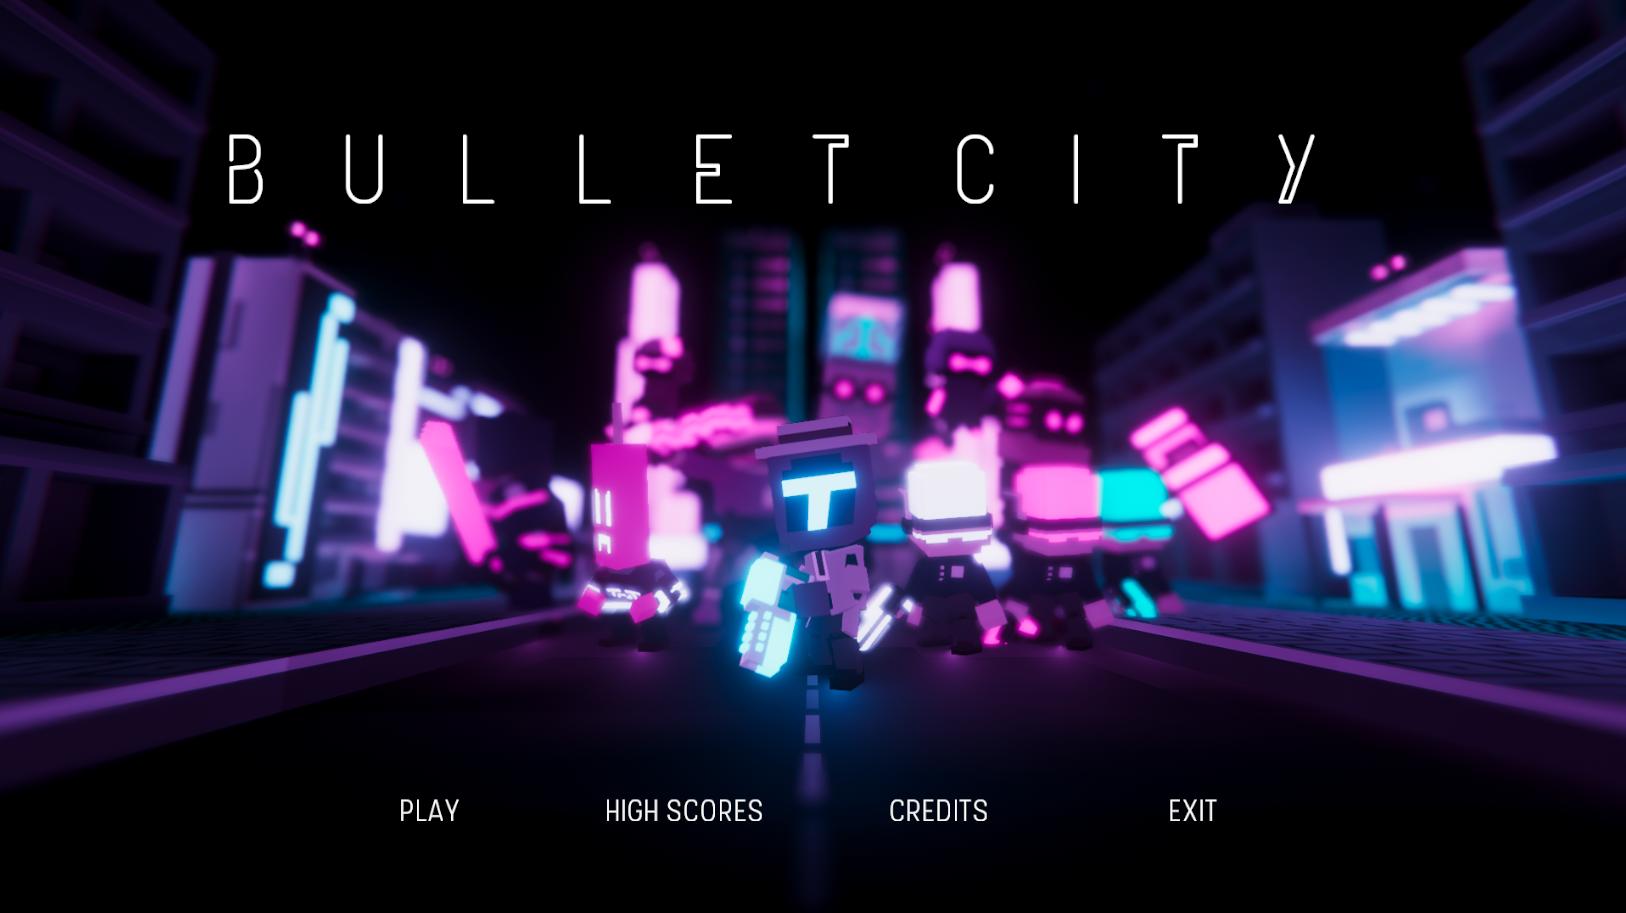 Bullet City